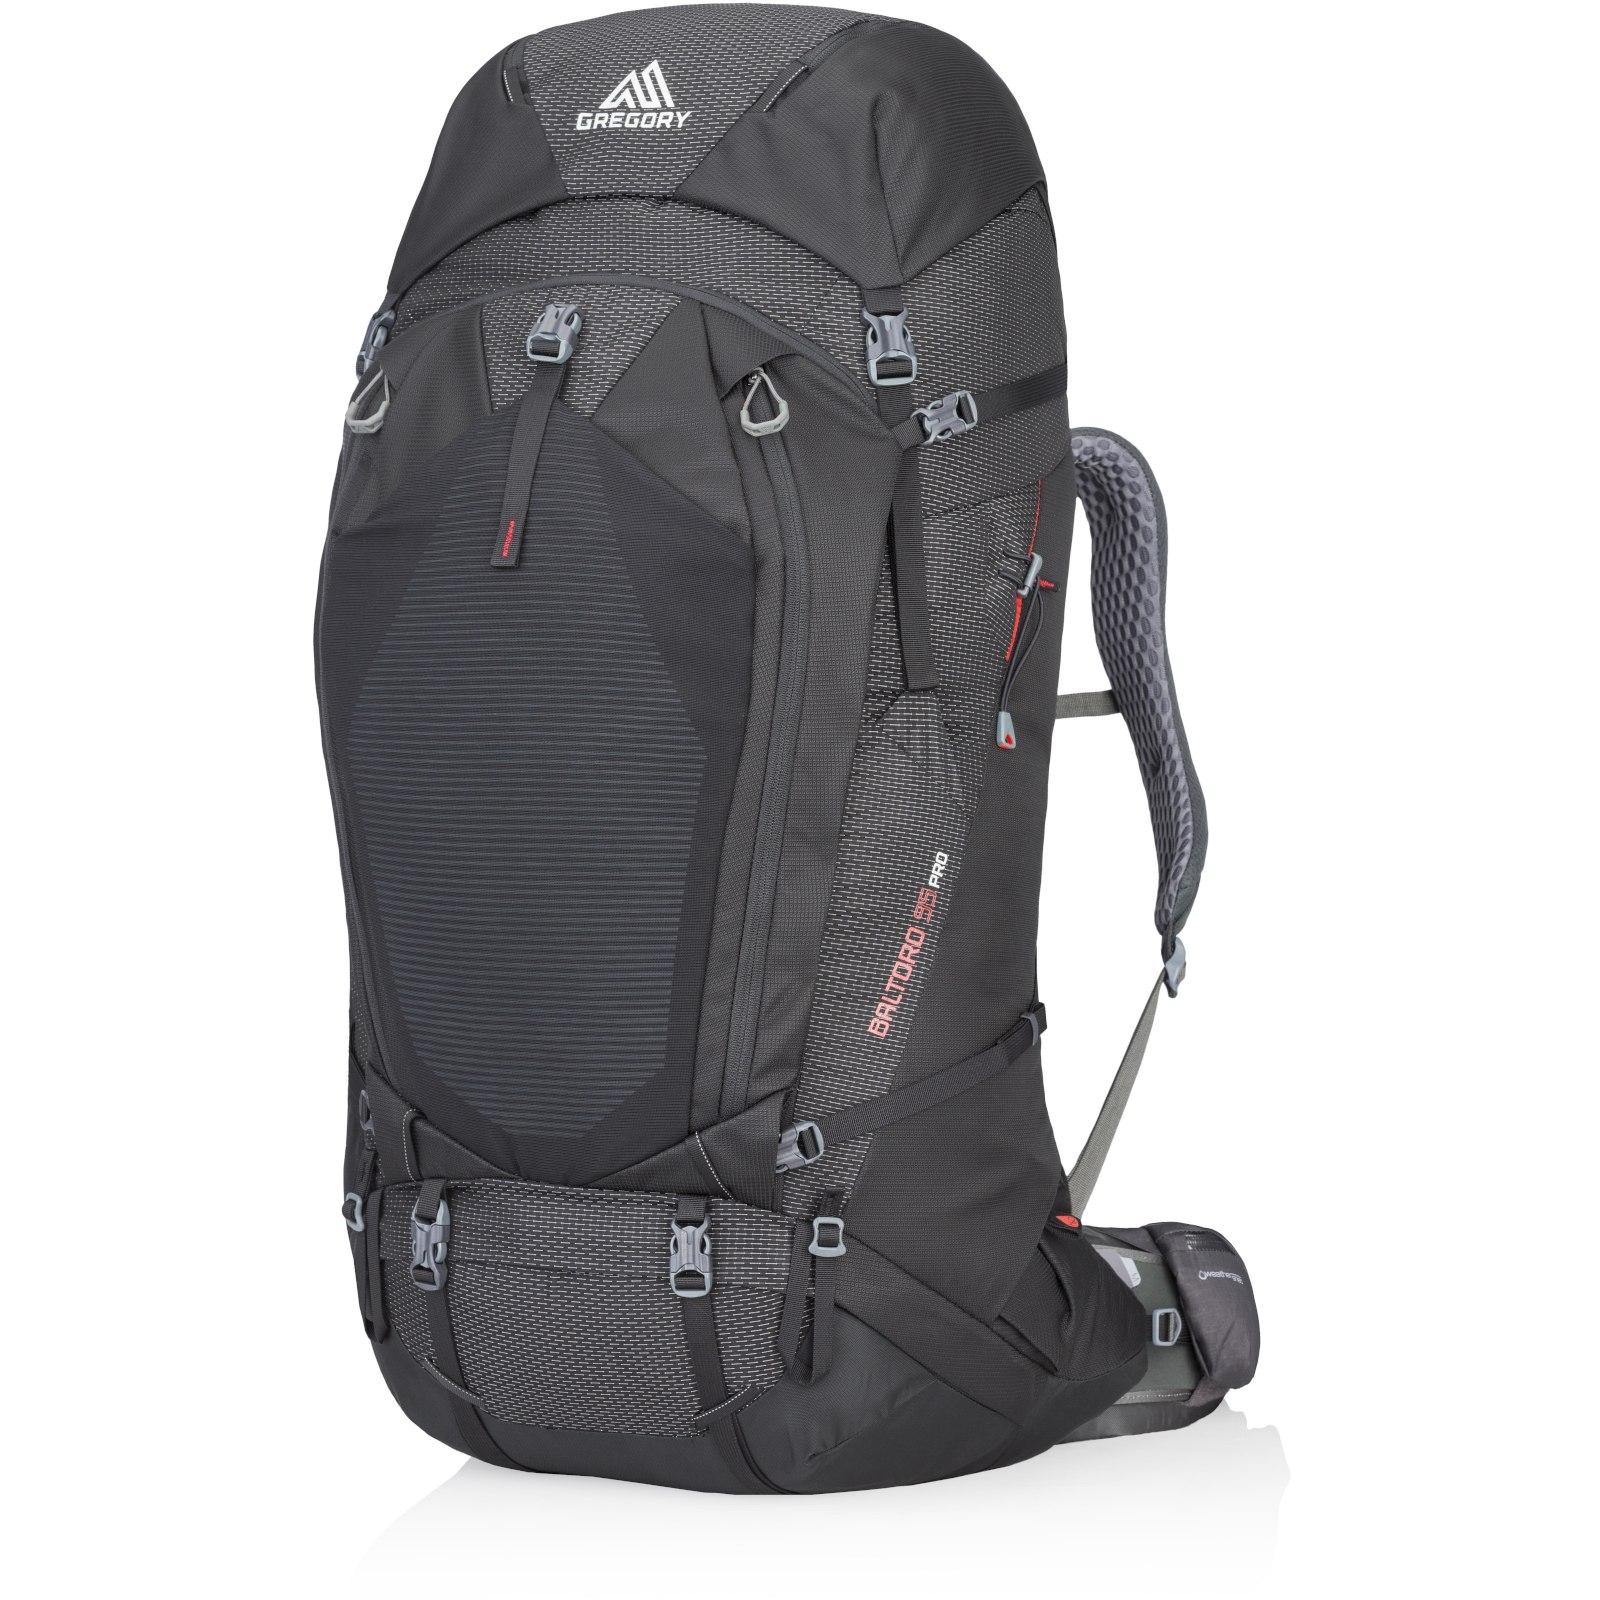 Gregory Baltoro 95 Pro Backpack - Volcanic Black